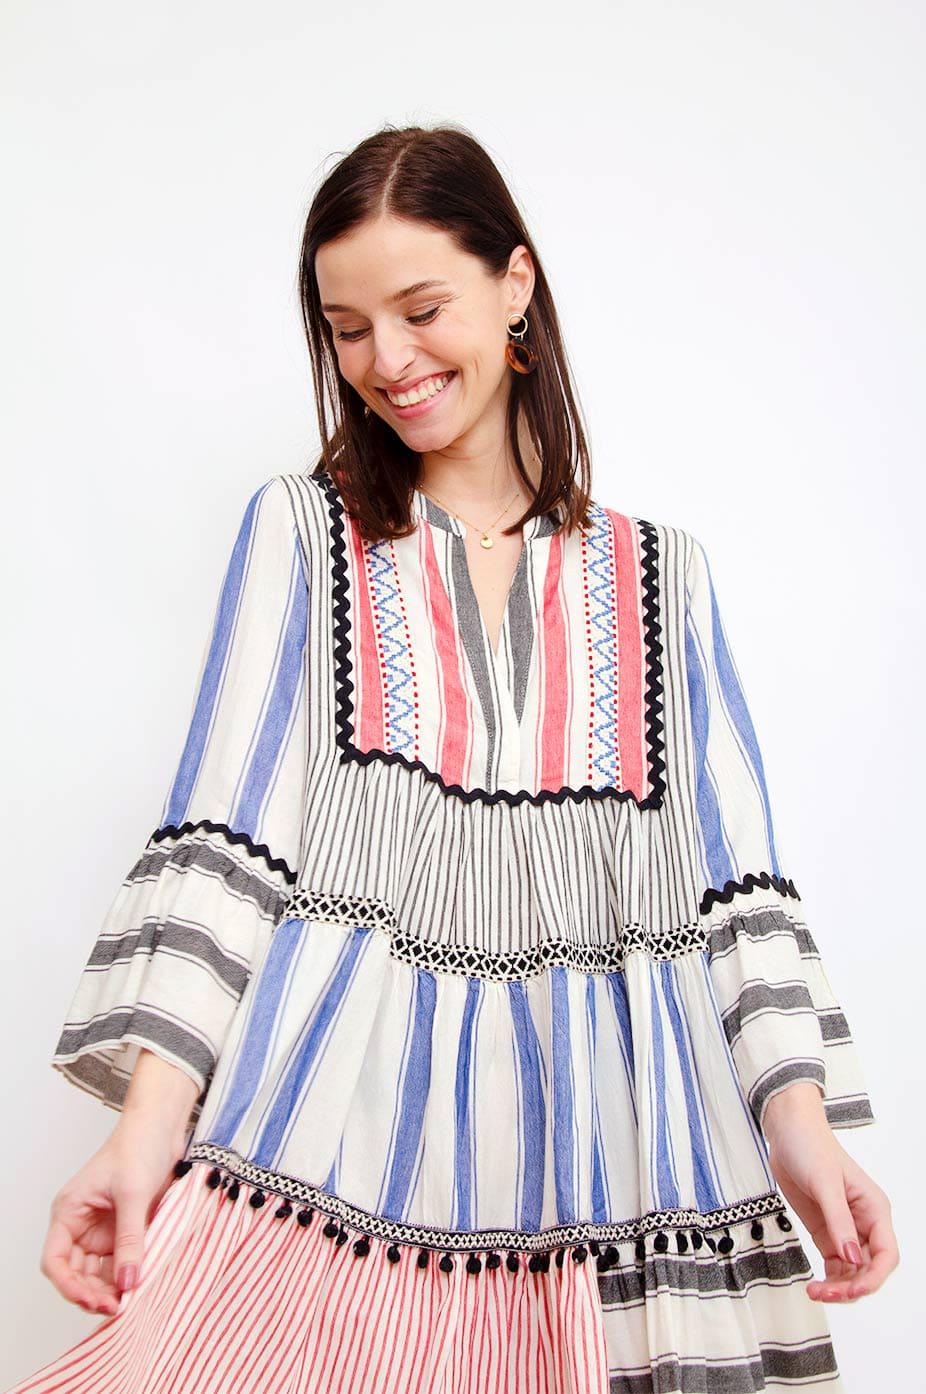 DEVOTION Mix Pom Poms Devotion Embroidery Dress